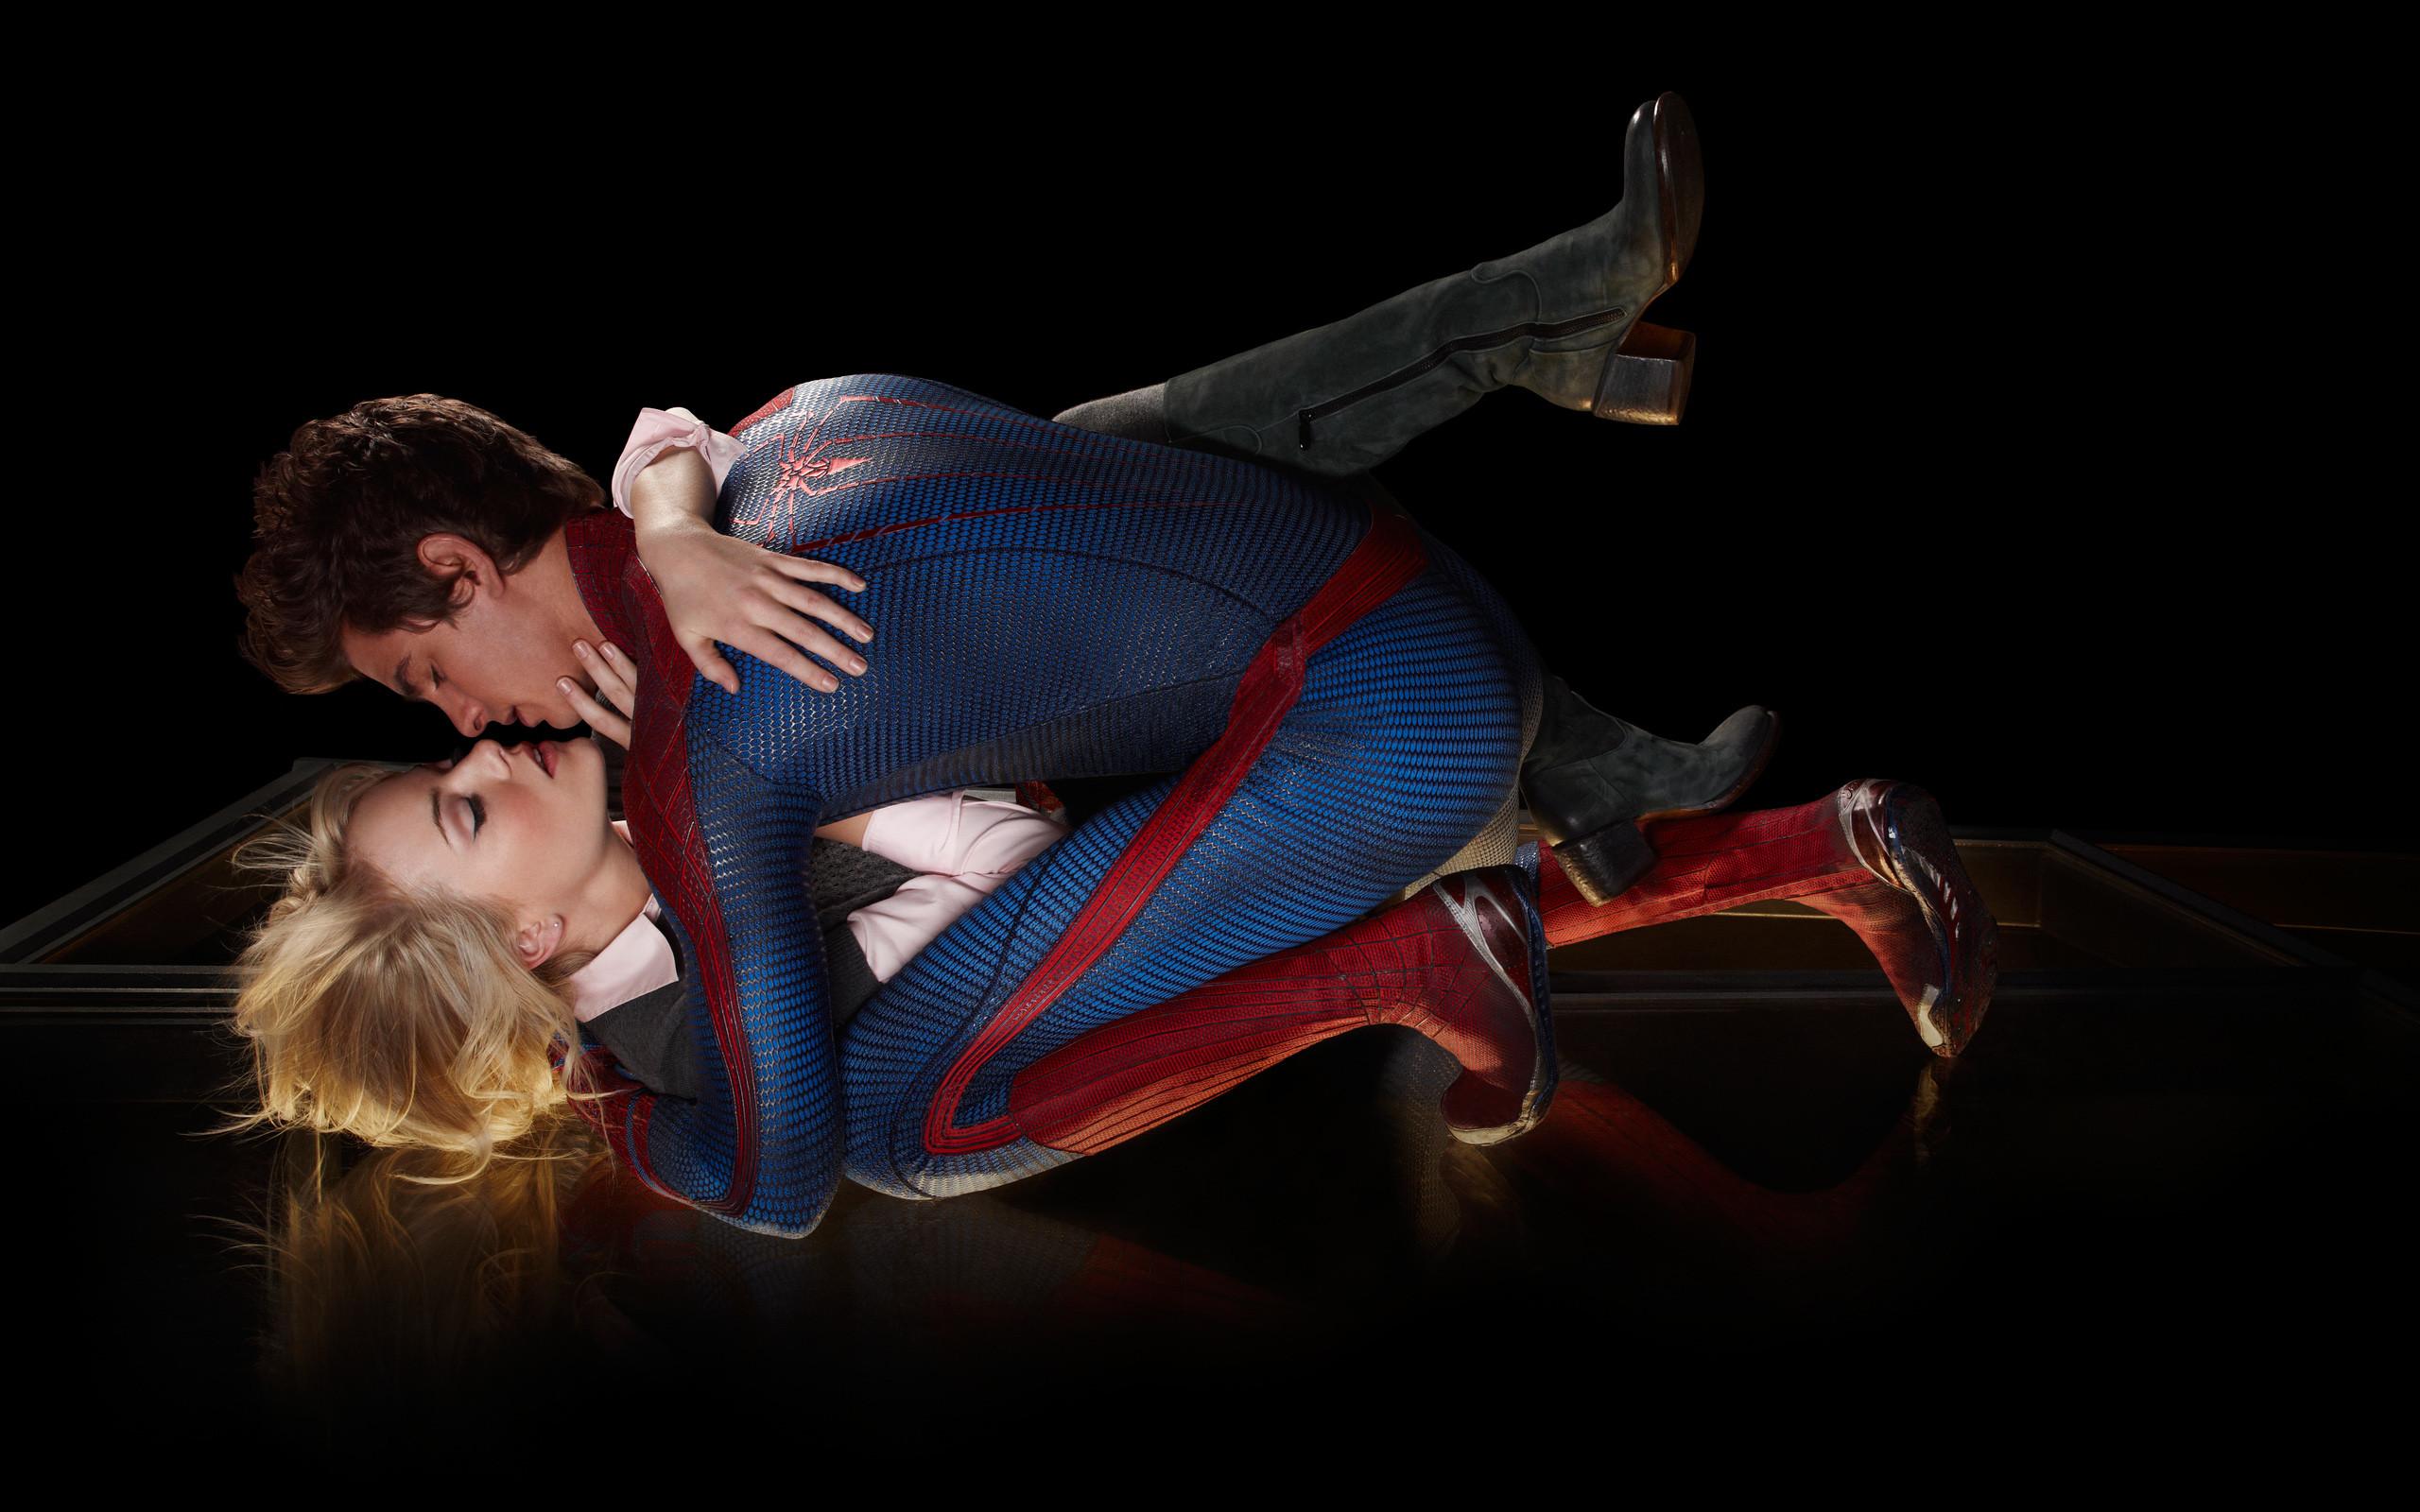 Amazing Spider Man Love Kiss wallpaper HD. Free desktop background .